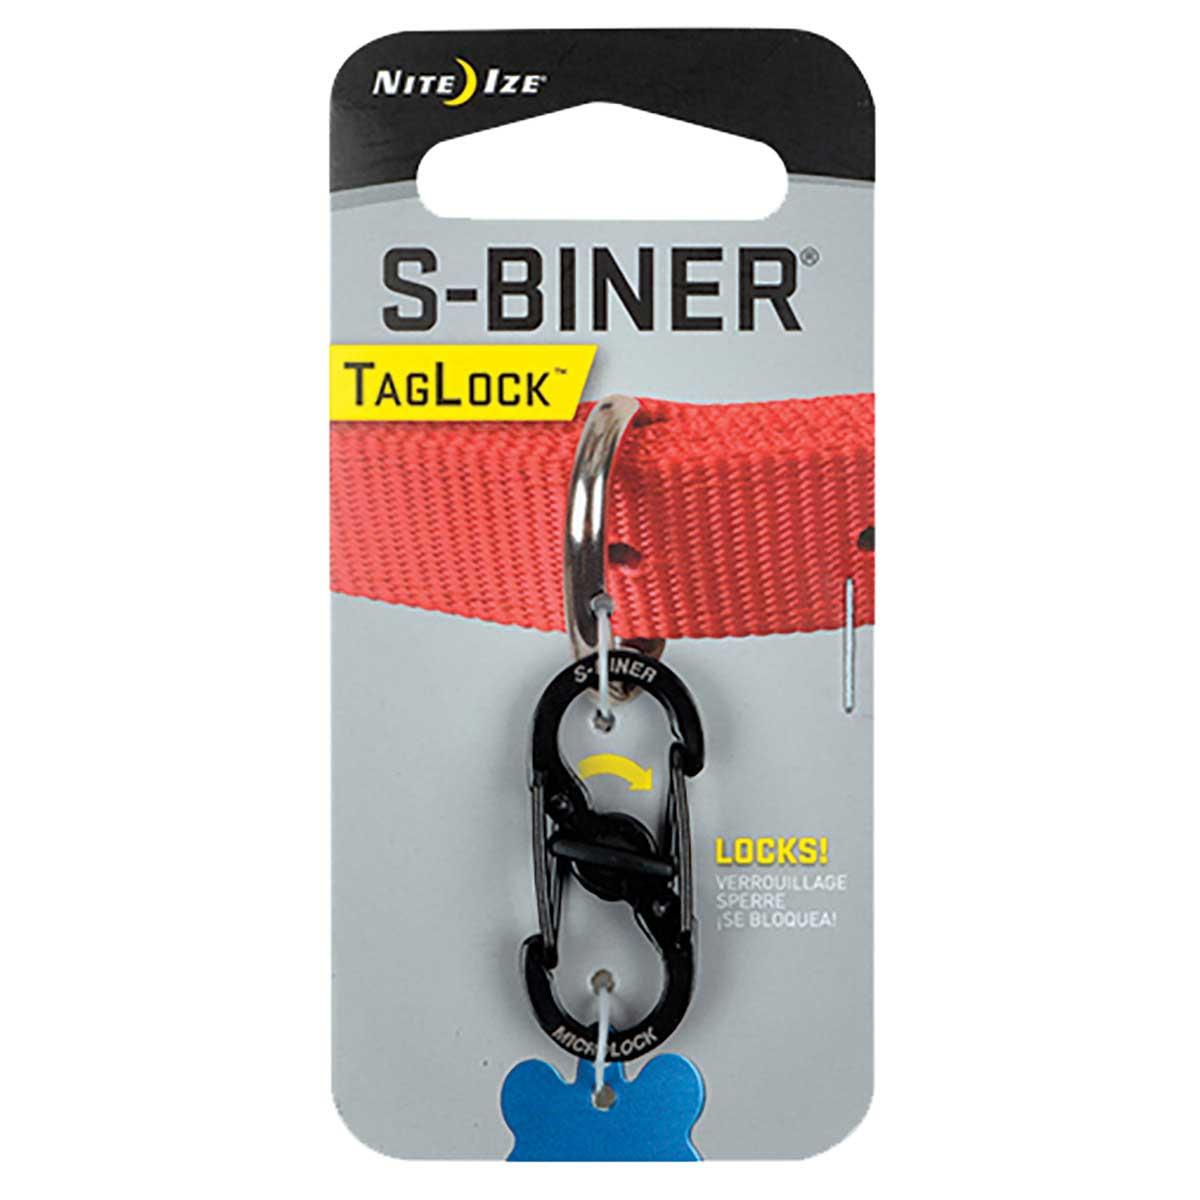 Nite Ize S-Biner Taglock for Dog Collars - Black Stainless